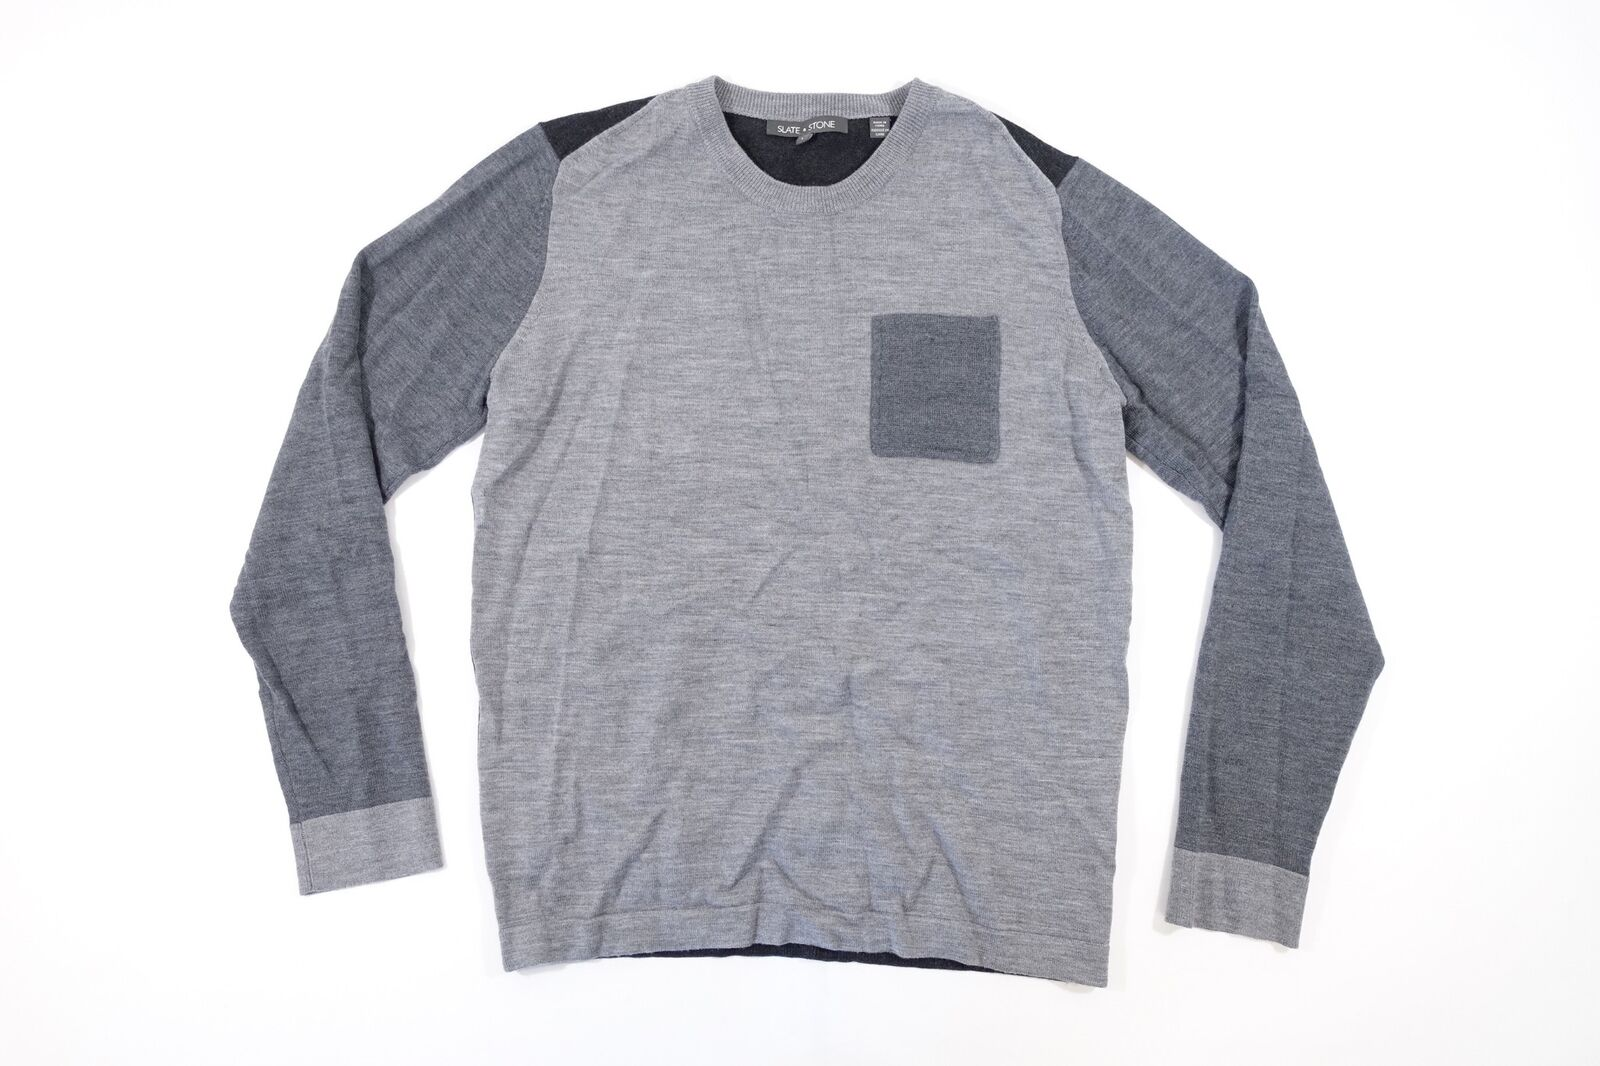 Slate & Stone Farbblock Grau Groß 100% Merino Wolle Tasche